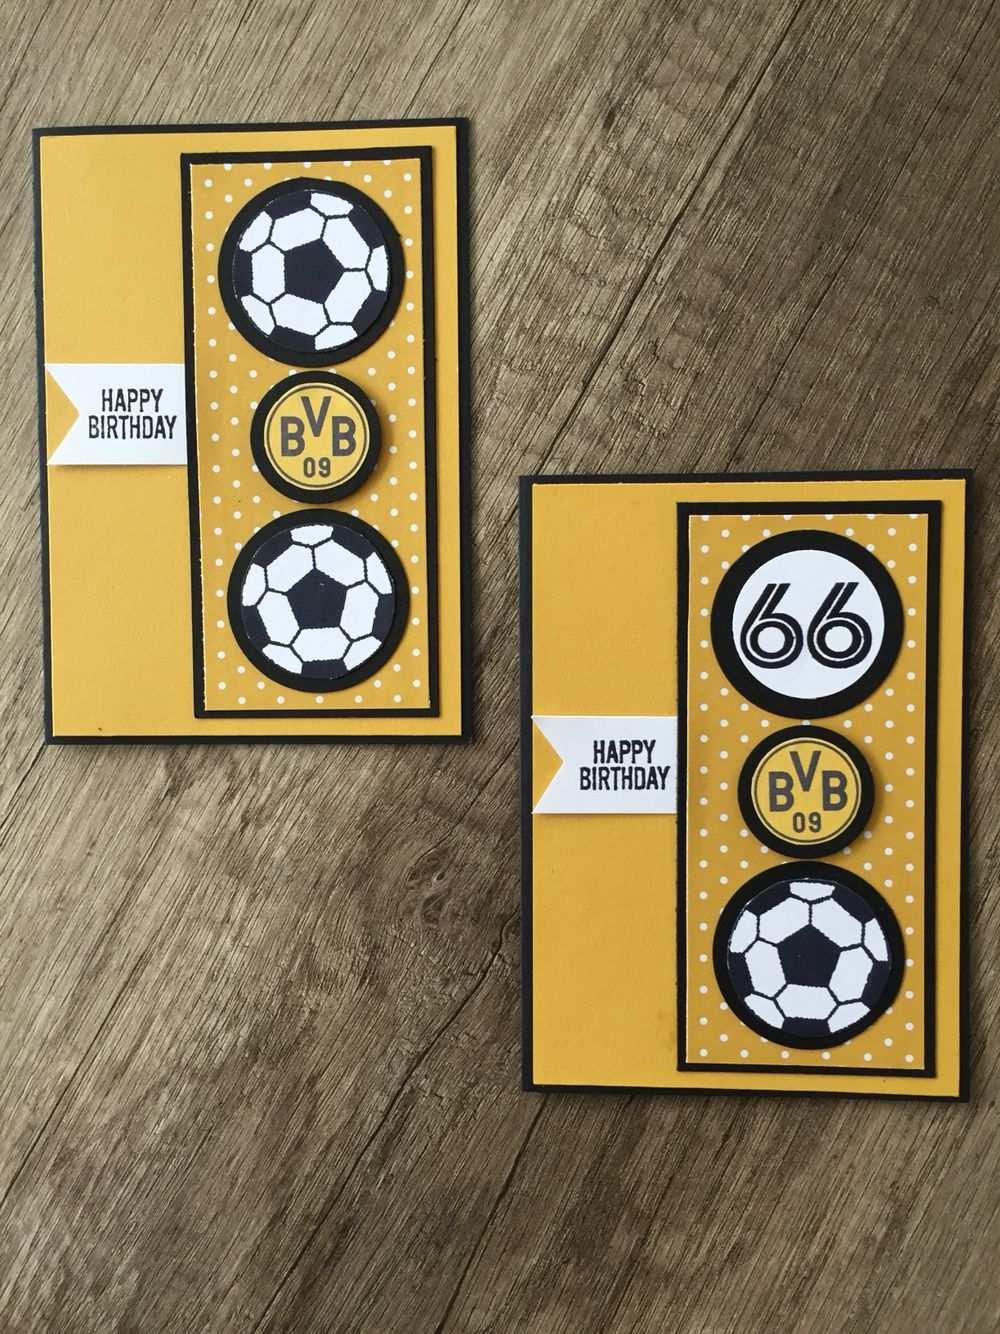 Fussballkarte Geburtstag Borussia Dortmund Paper Crafts Cards Male Cards Kids Cards